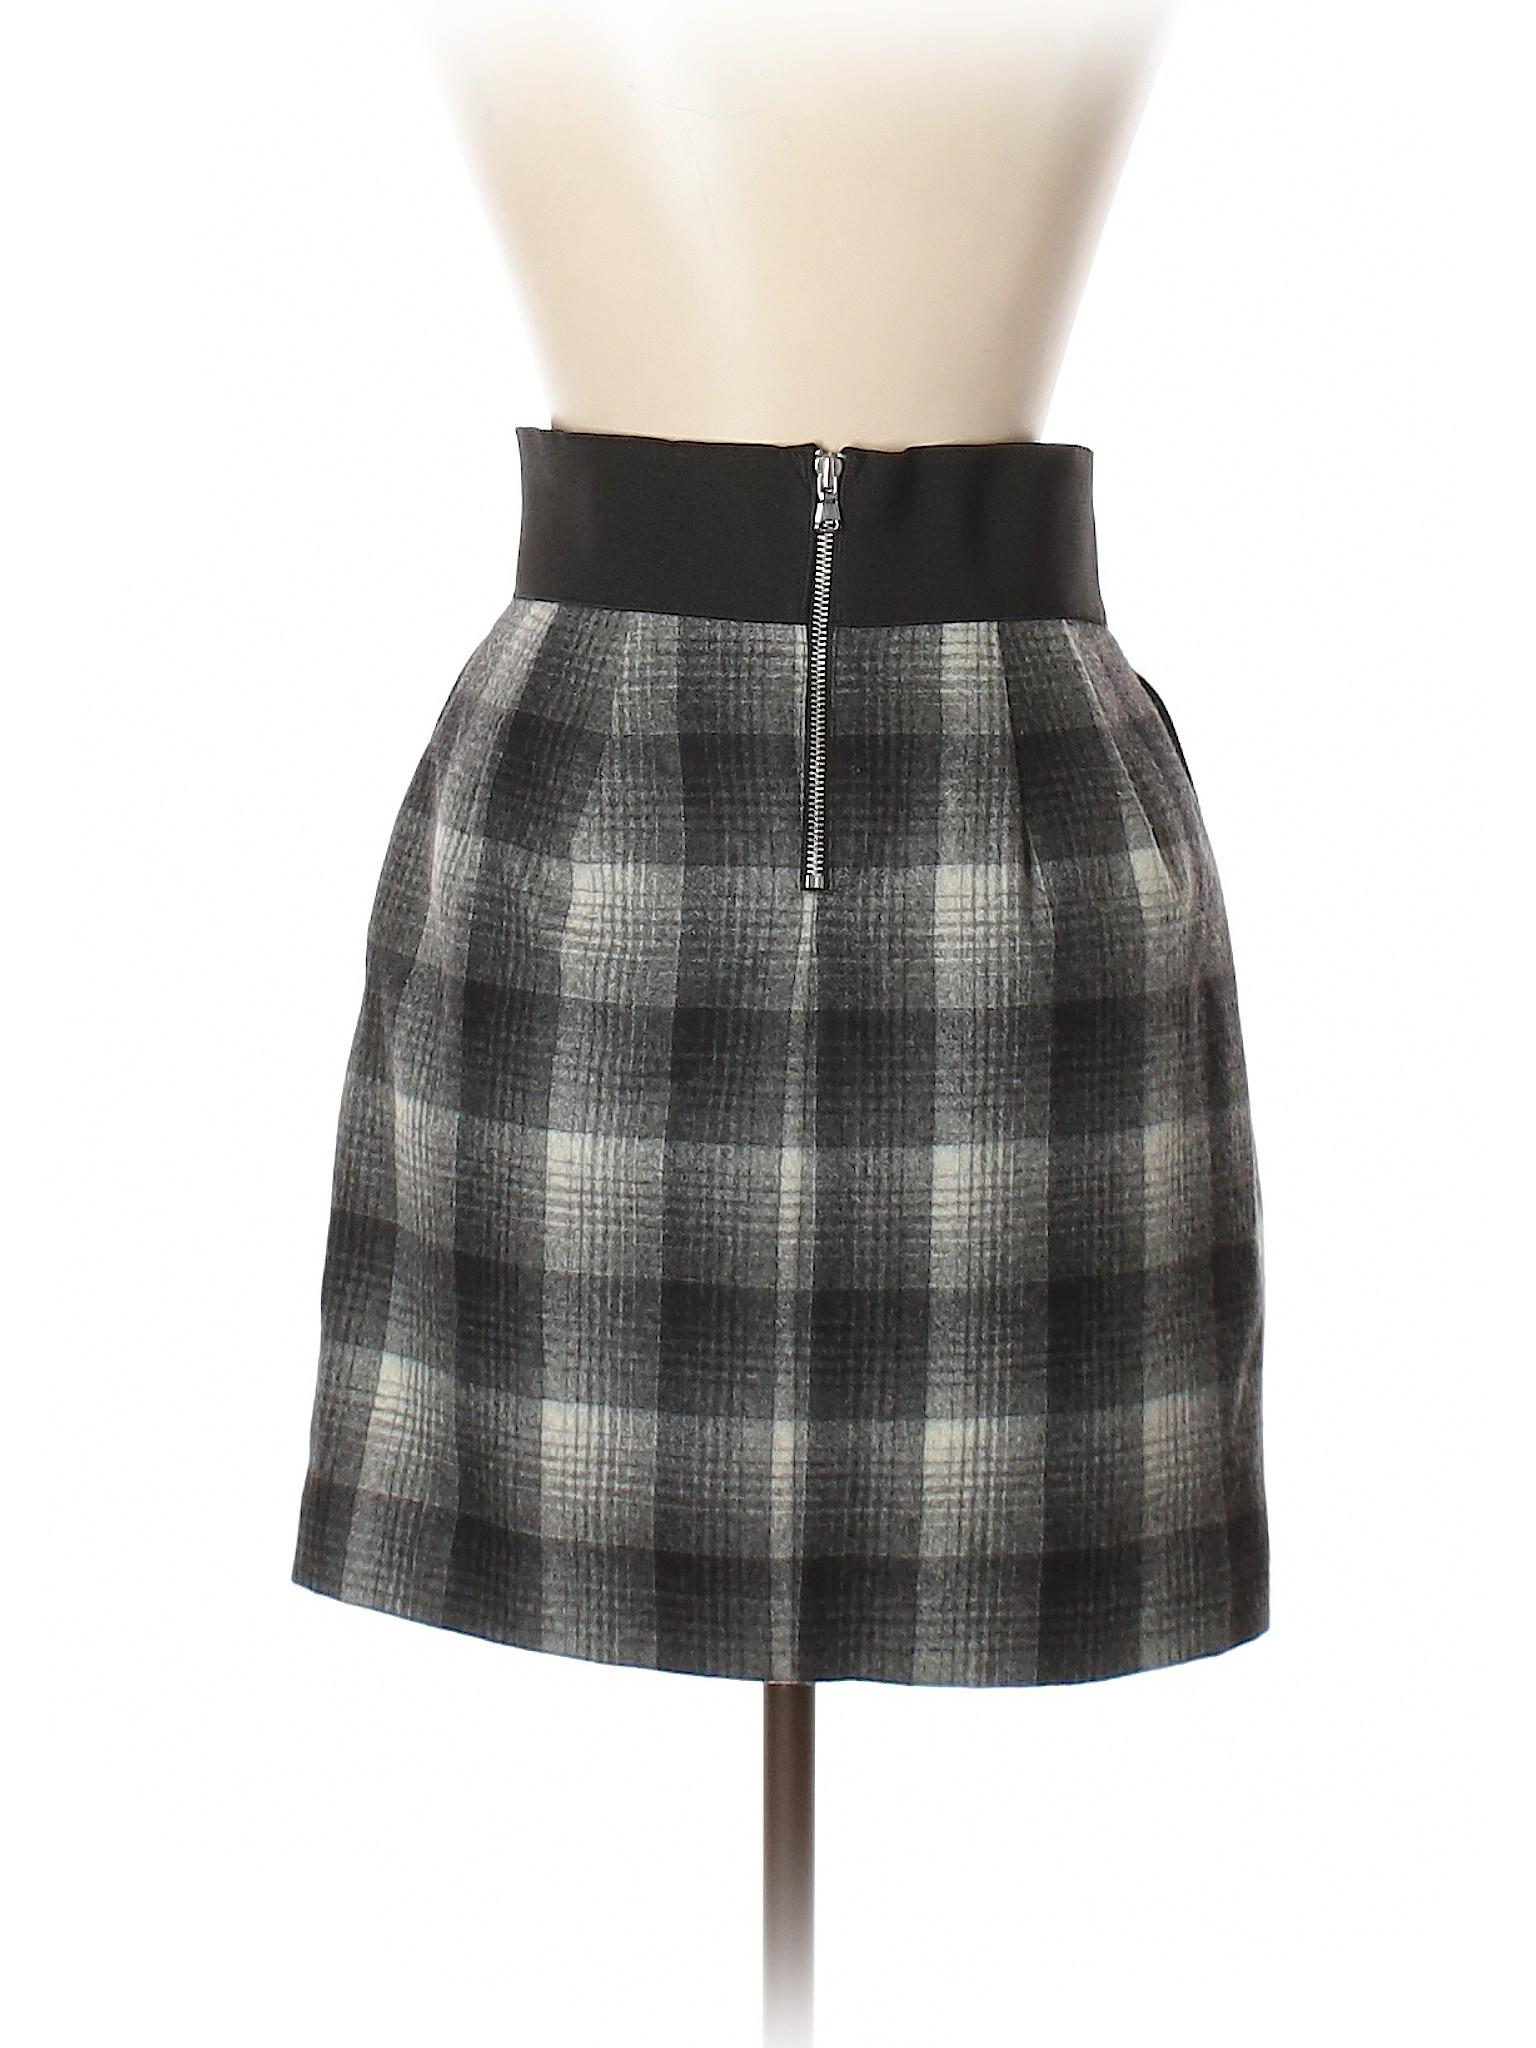 Wool Skirt Boutique Boutique Boutique Wool Skirt Wool Skirt wqtYnnOz